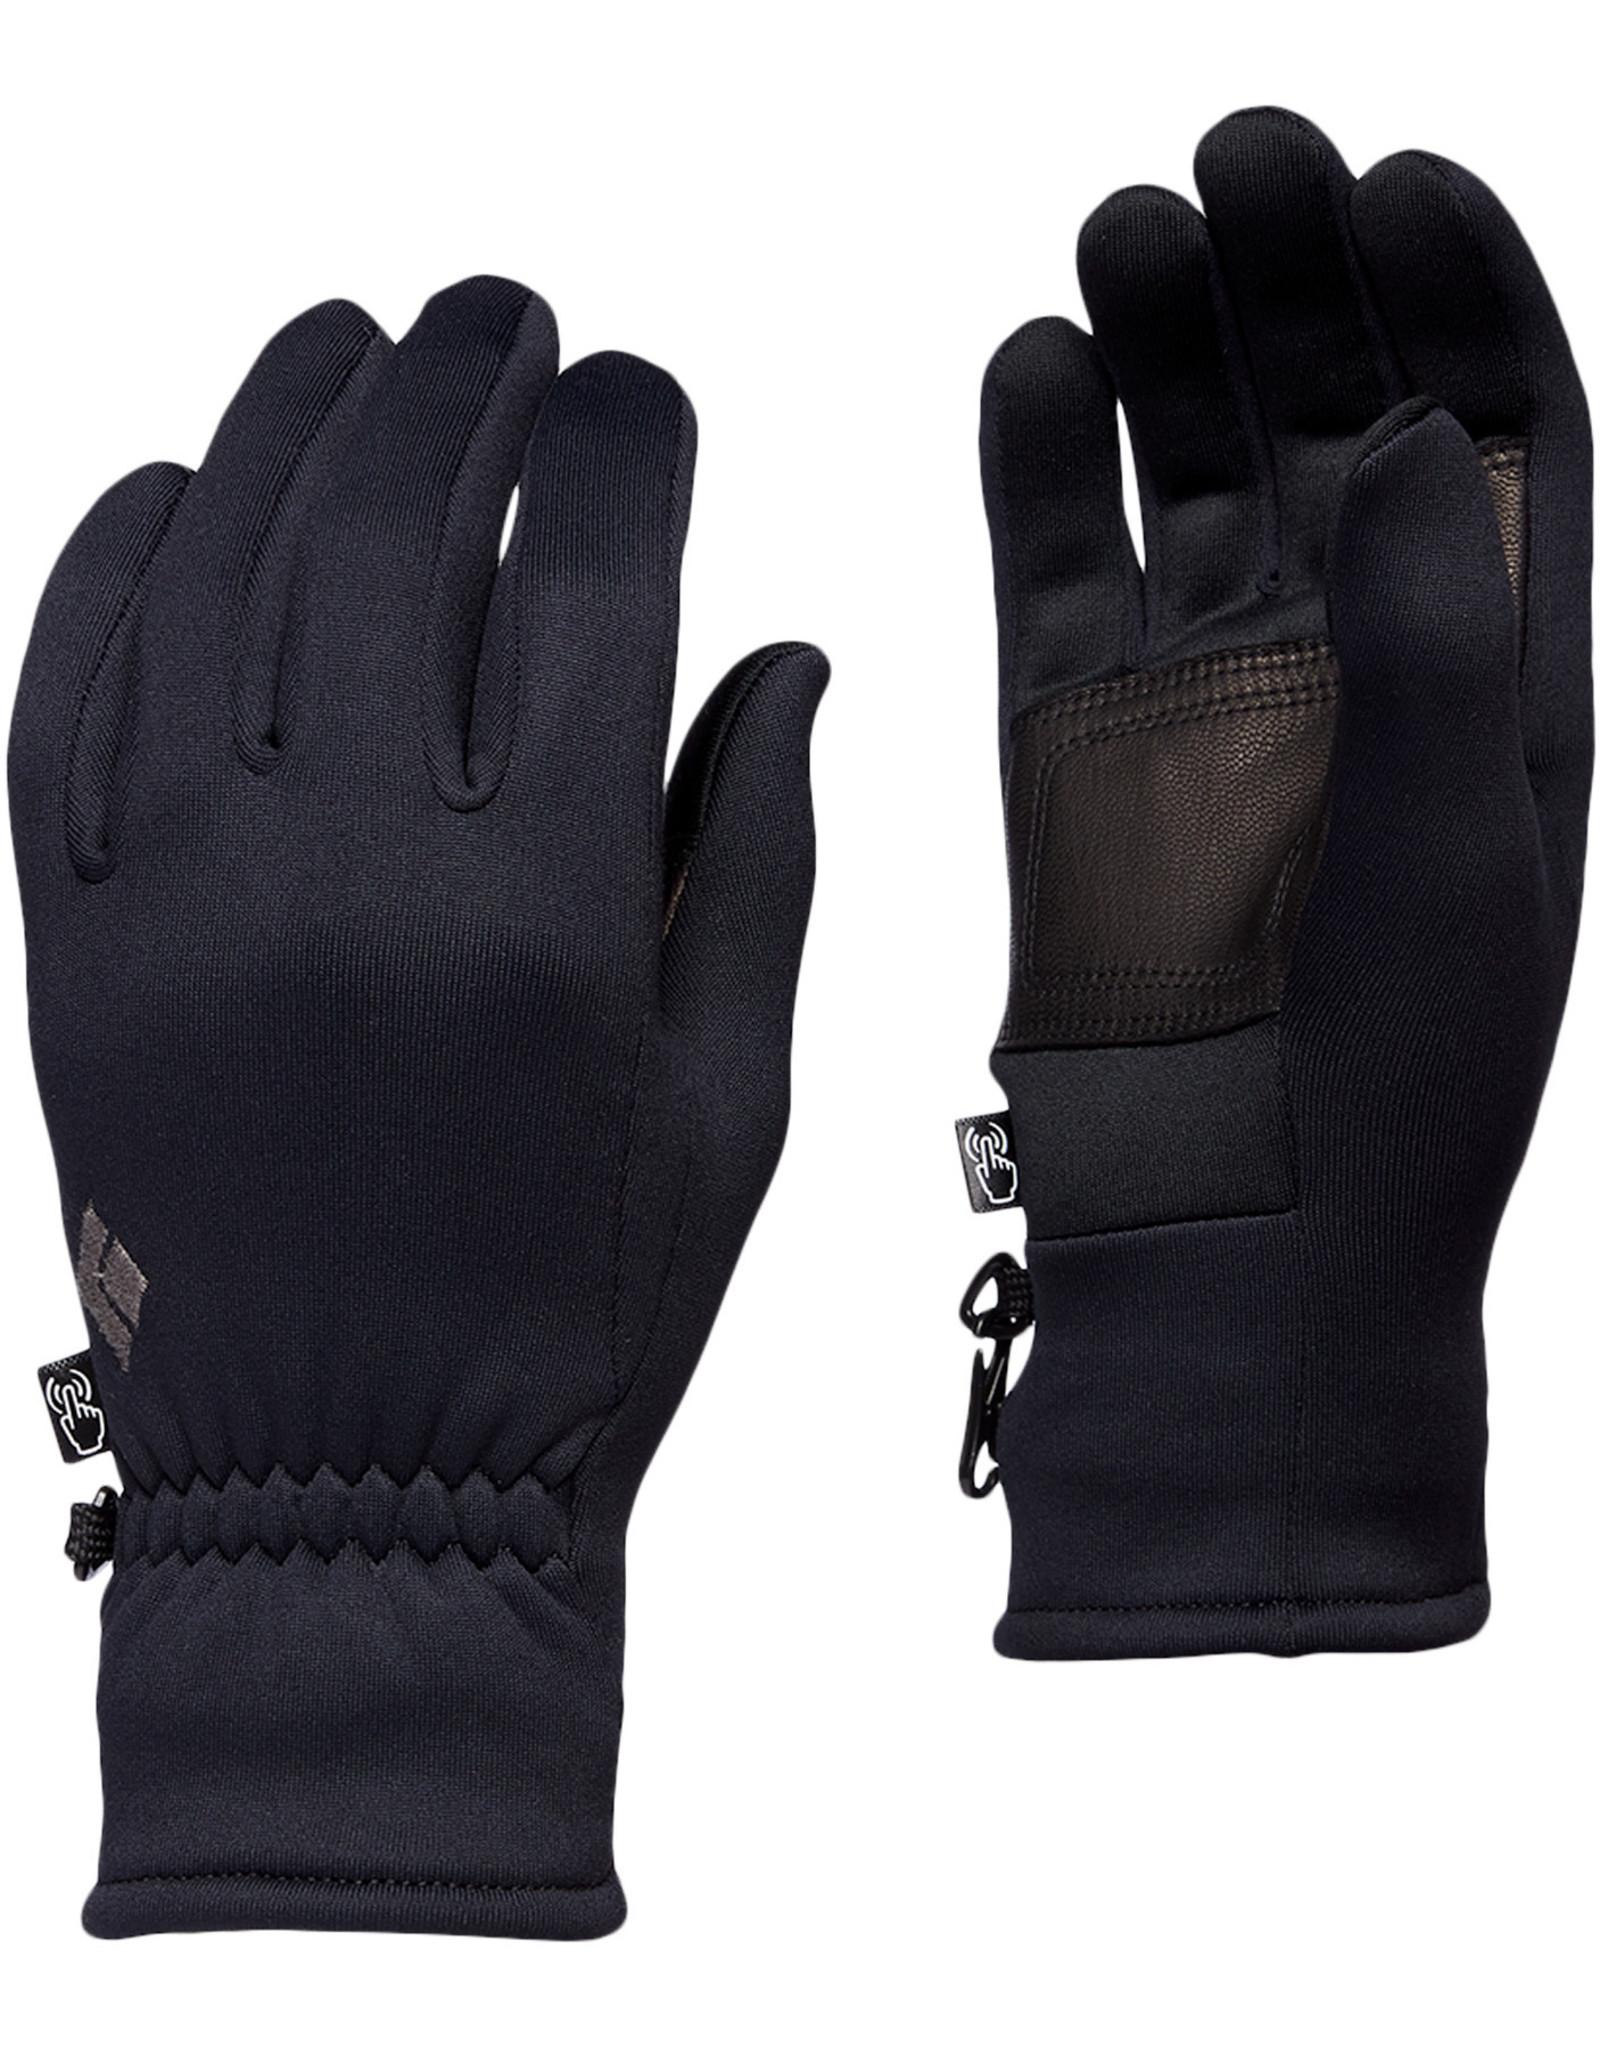 Black Diamond Black Diamond Heavyweight  Screentap Liner Glove